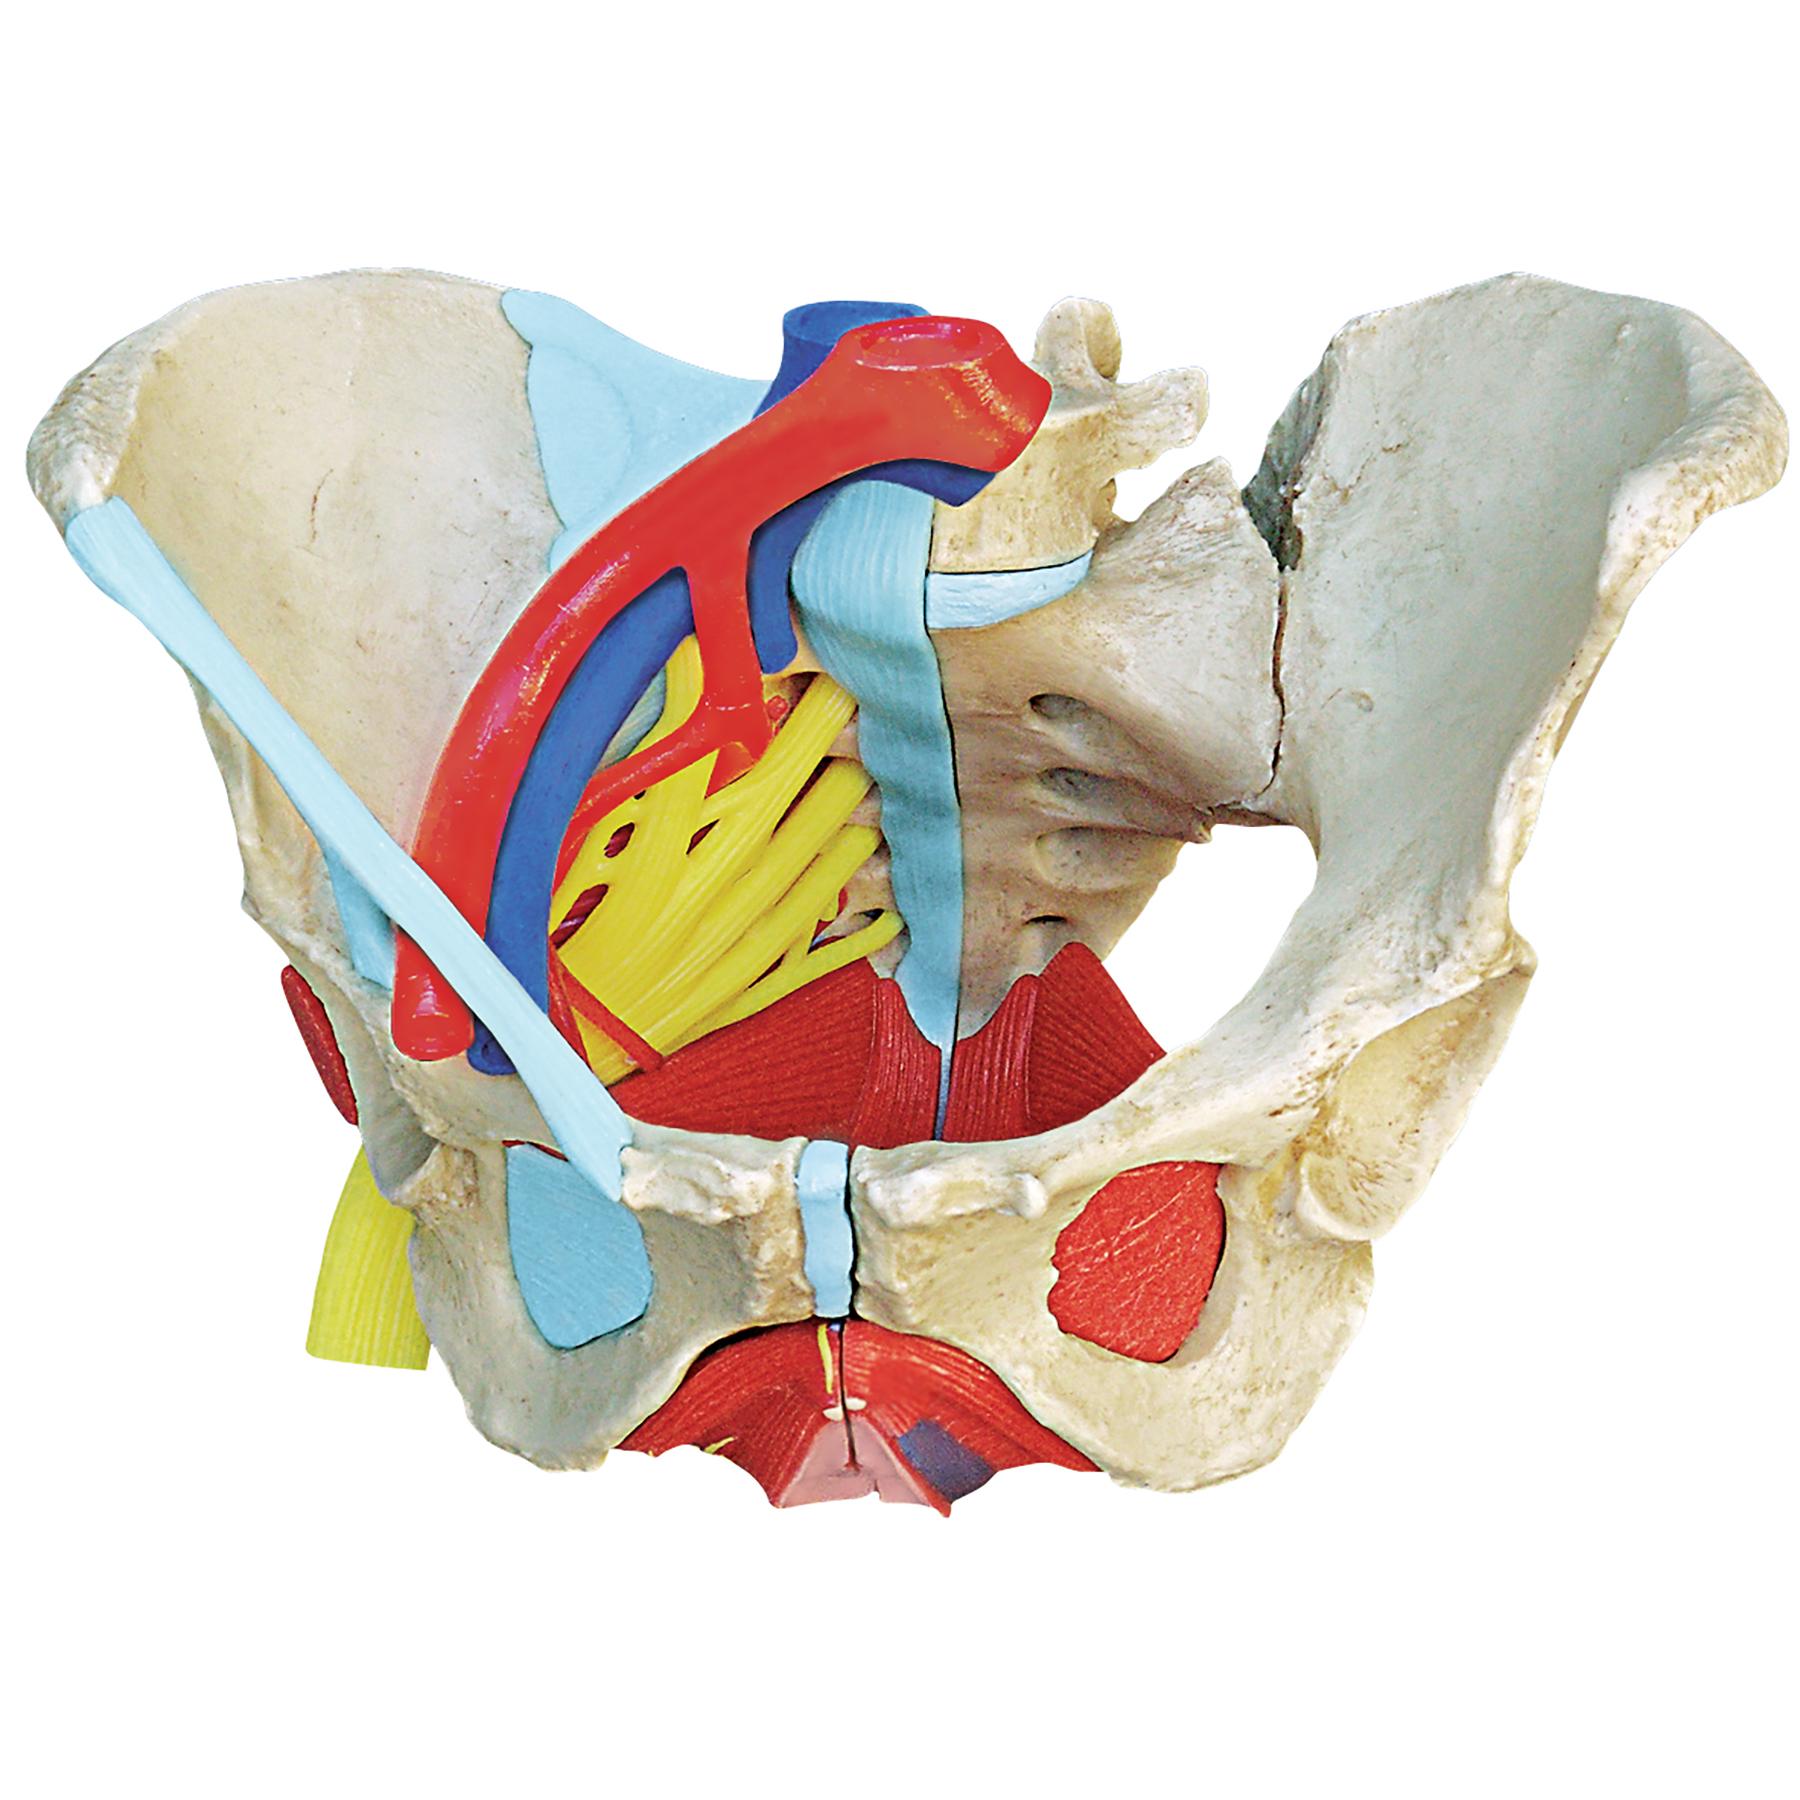 Anatomical Female Pelvis Model | Childbirth Graphics